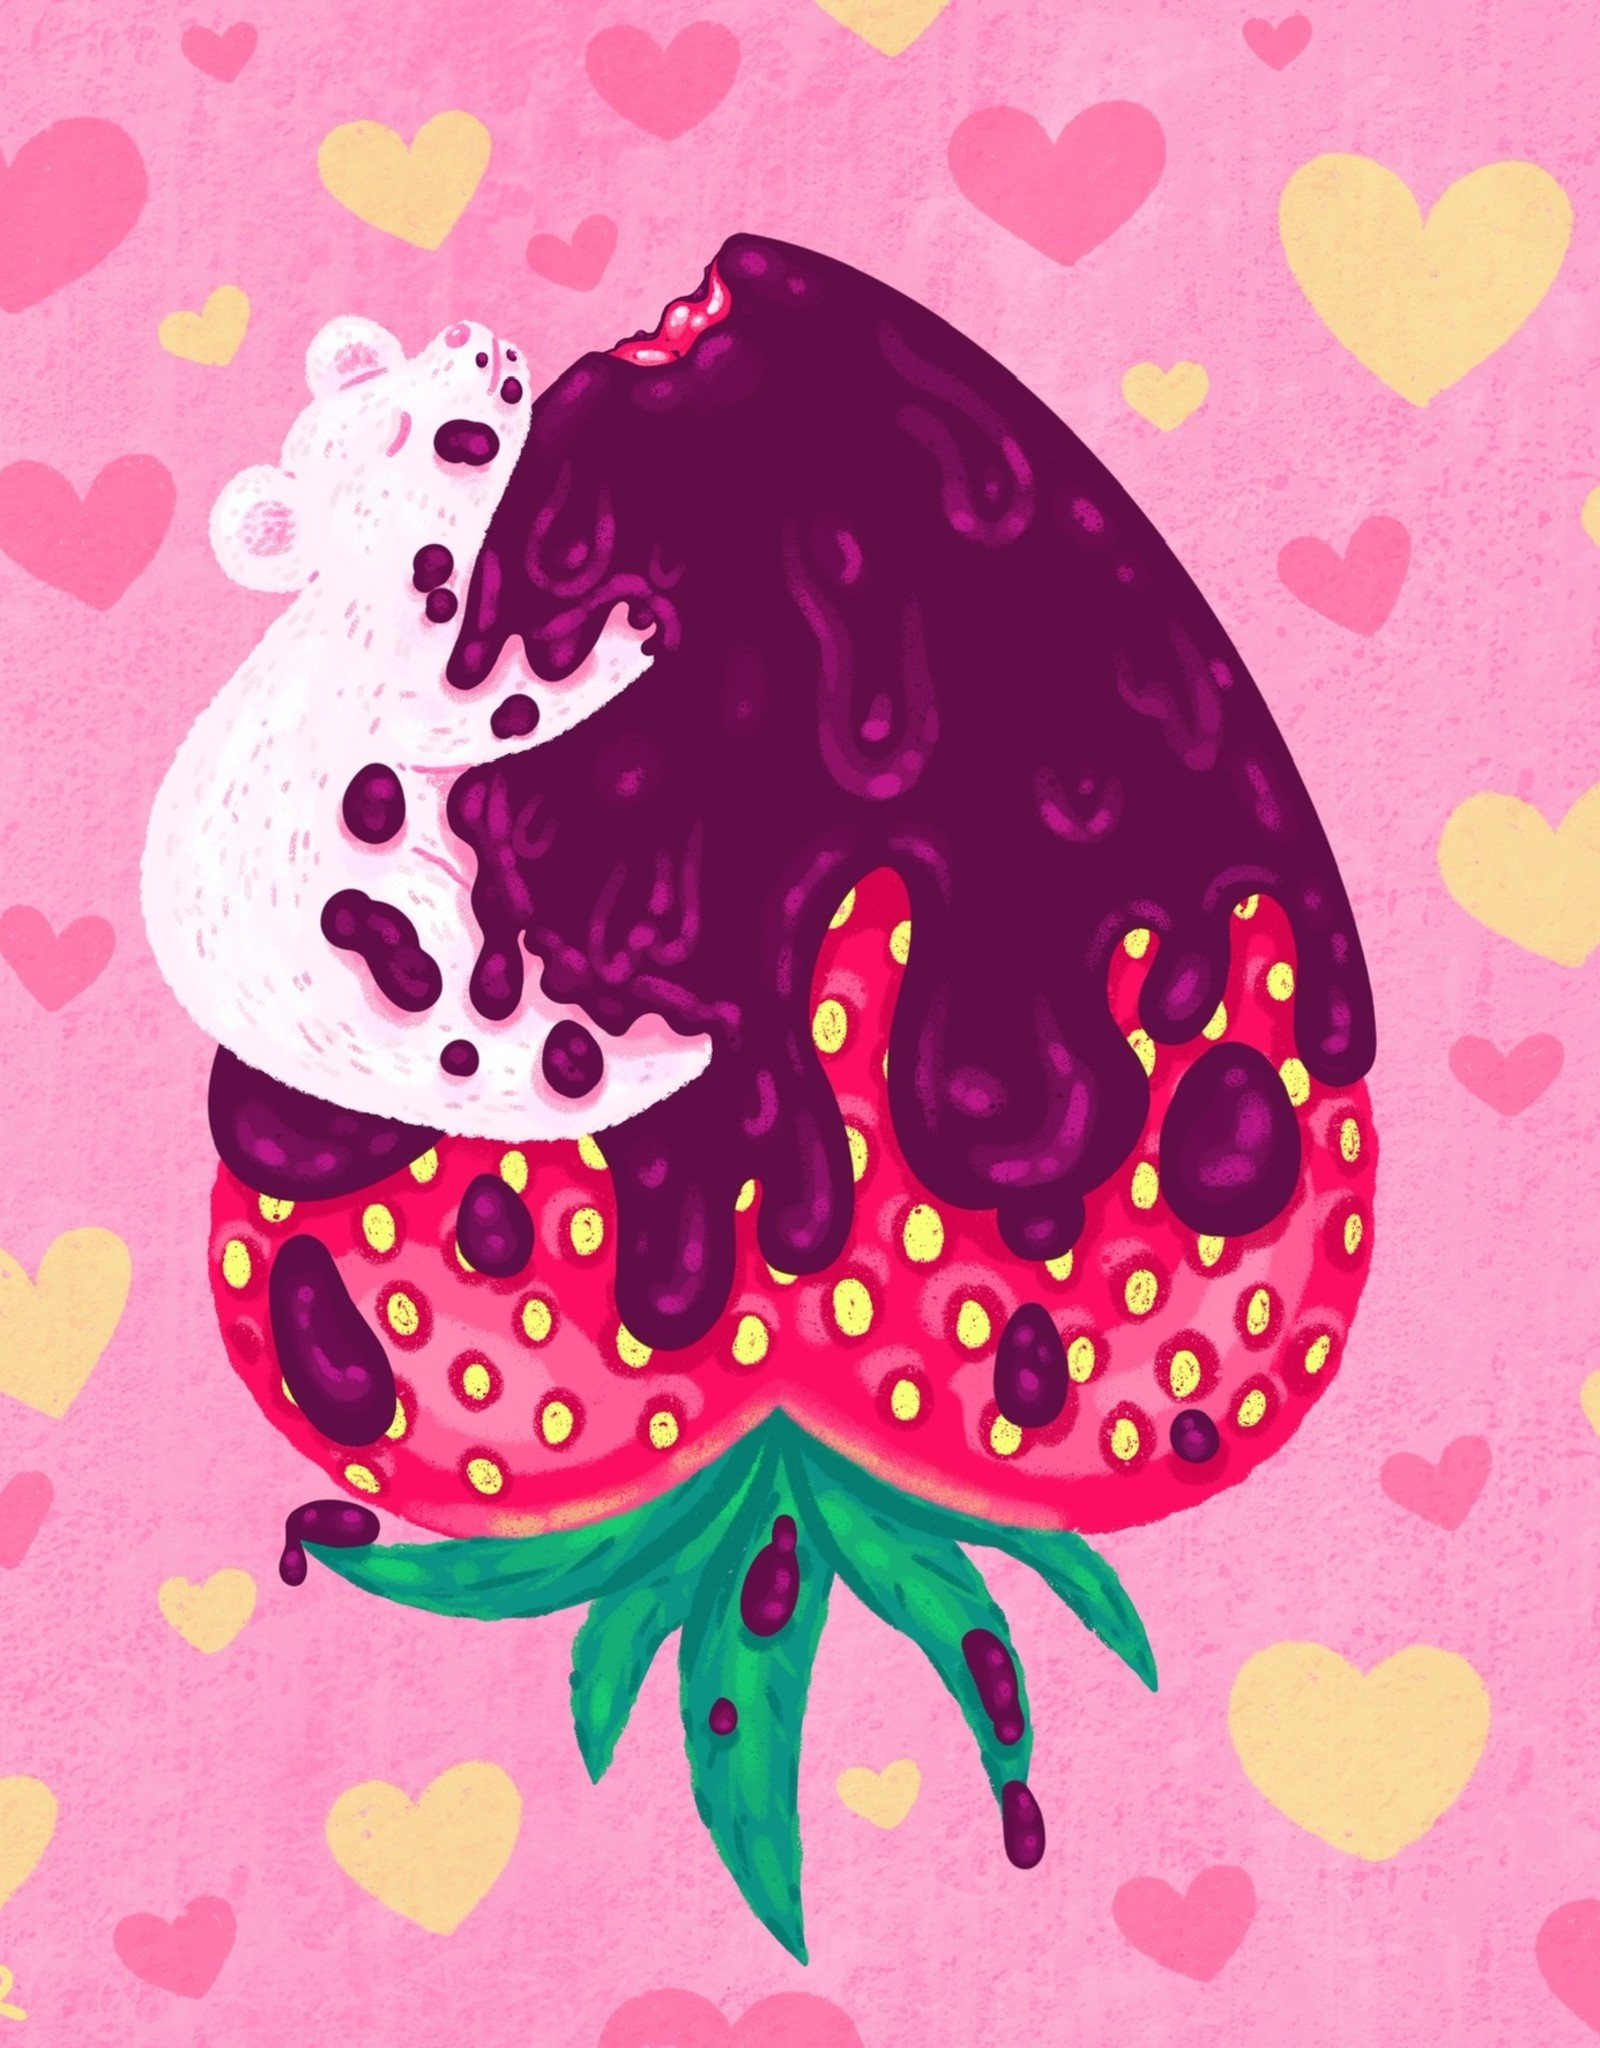 Megan Rivera 'Chocolate Strawbeary'' sticker by Megan M. Rivera